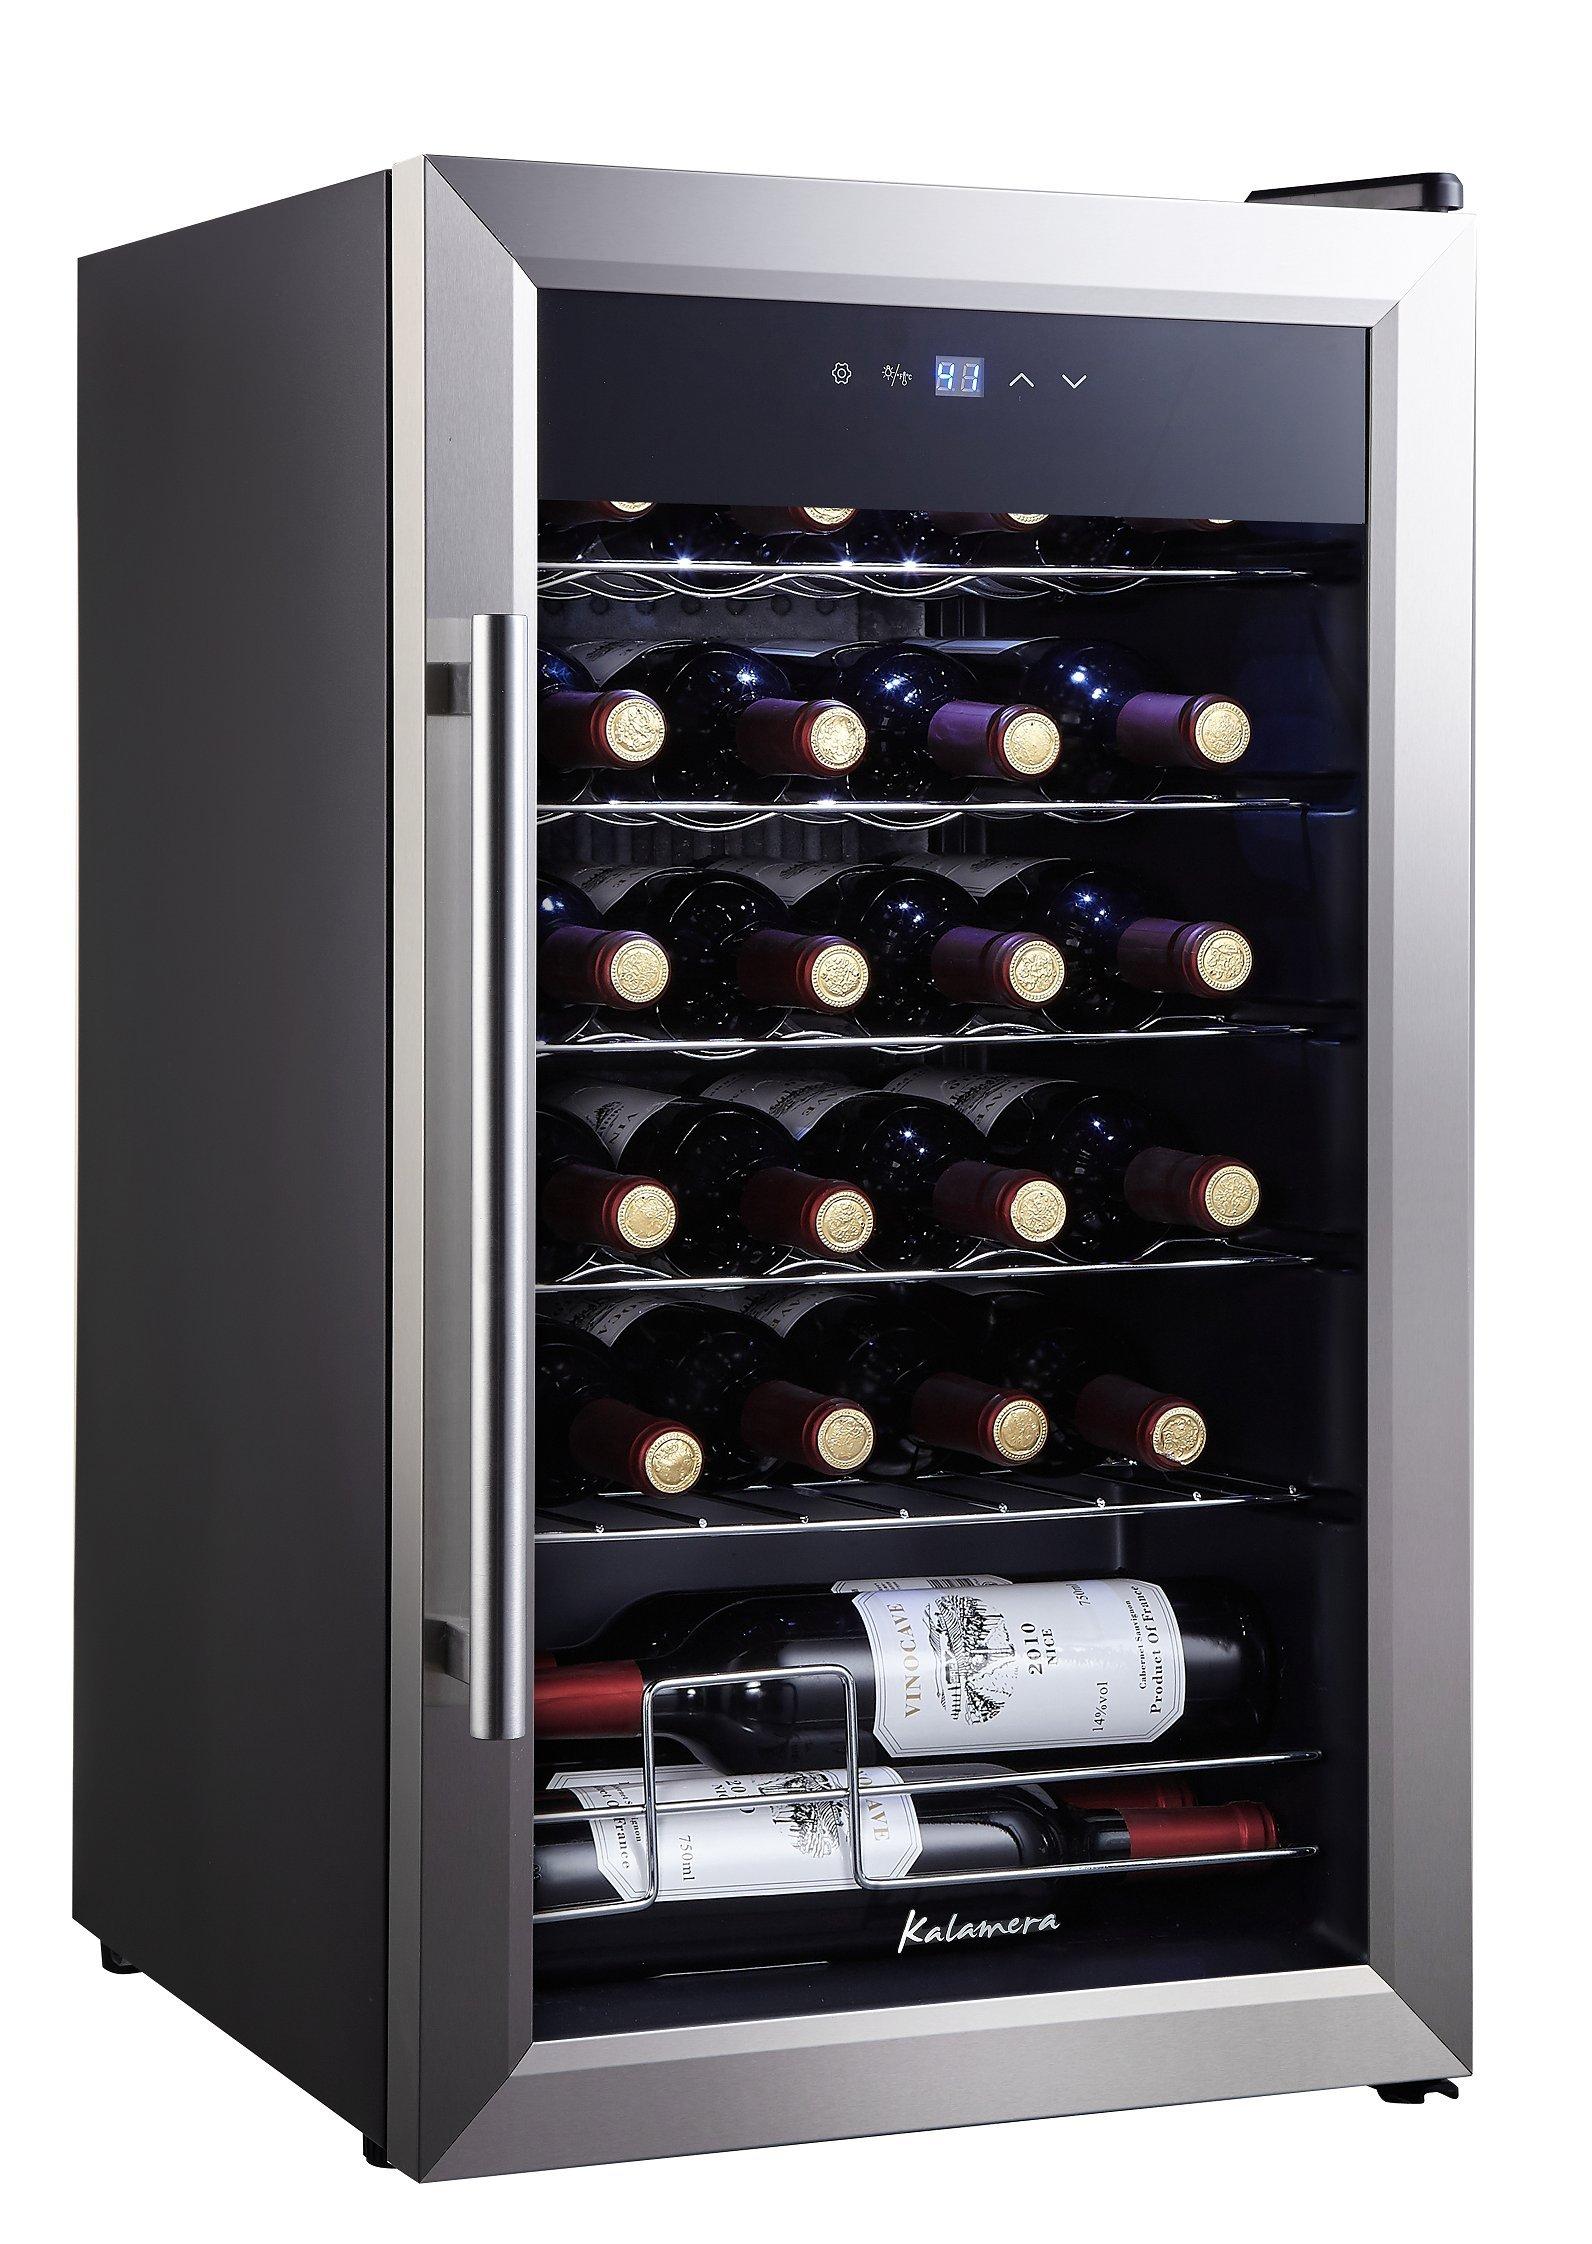 Kalamera KRC-24SS 24 Bottle Single Zone Wine Cooler Small Fridge, Black by Kalamera